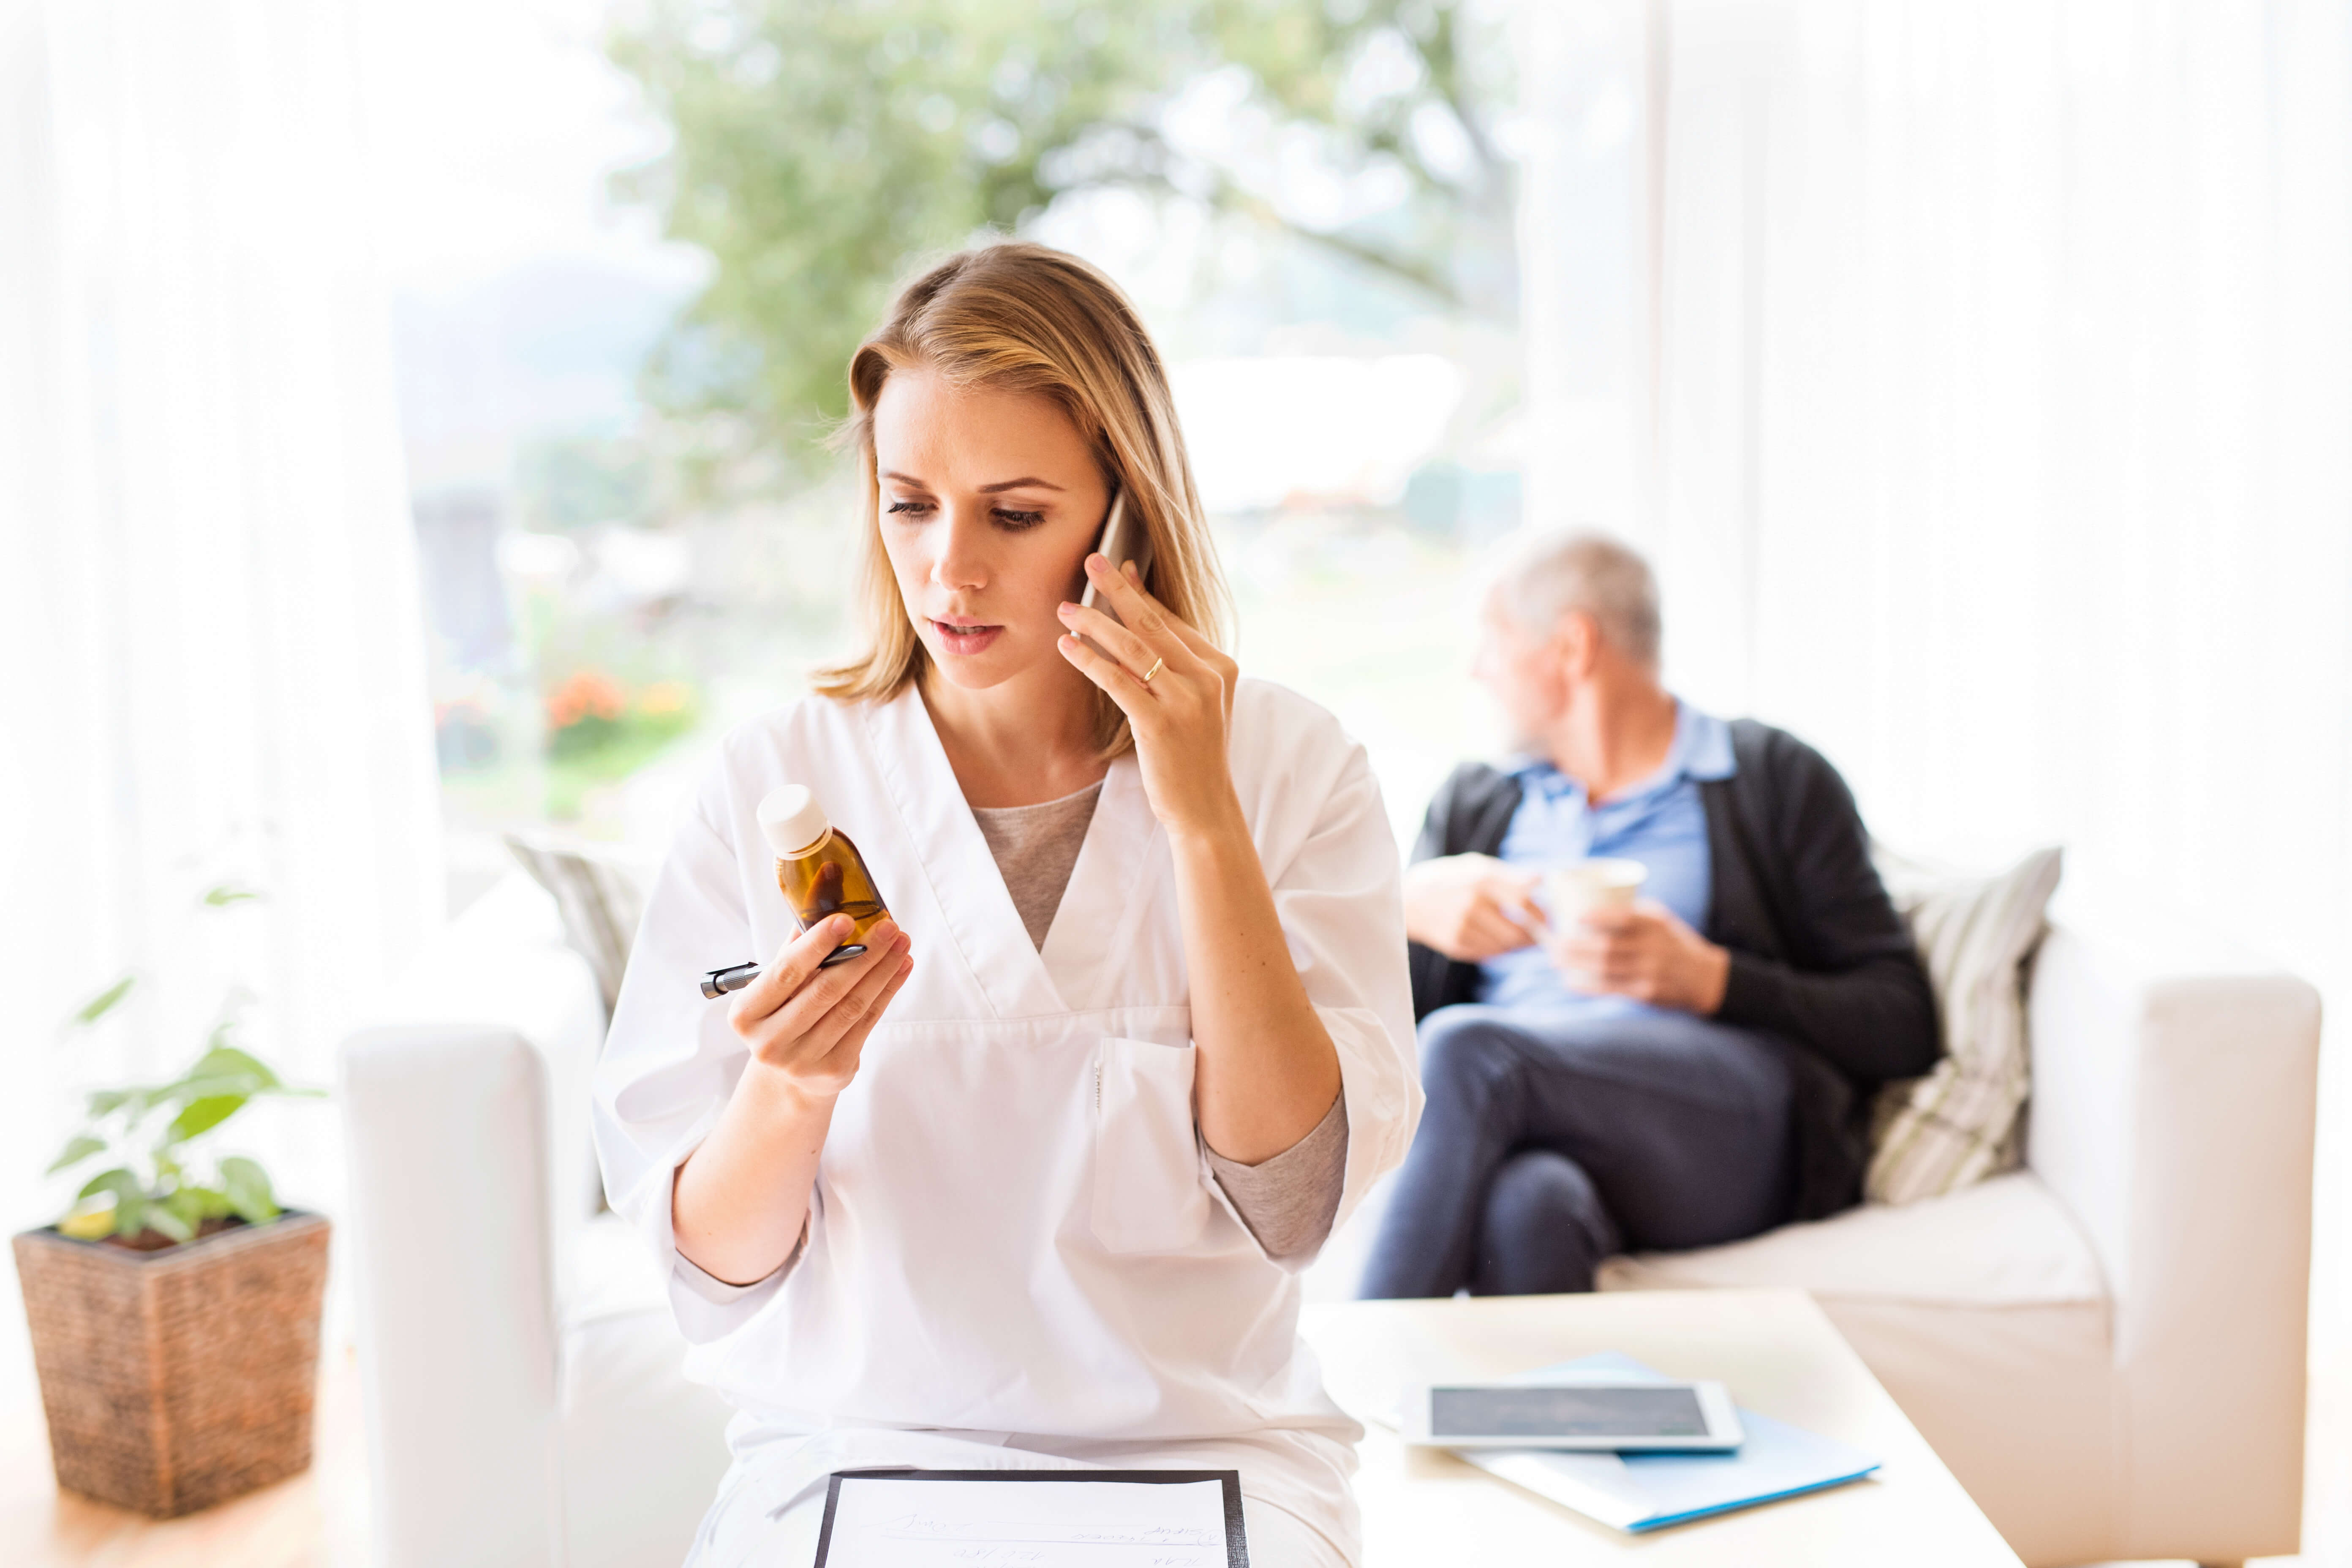 woman bottle man behind plant blonde sofa telephone-triage hospital